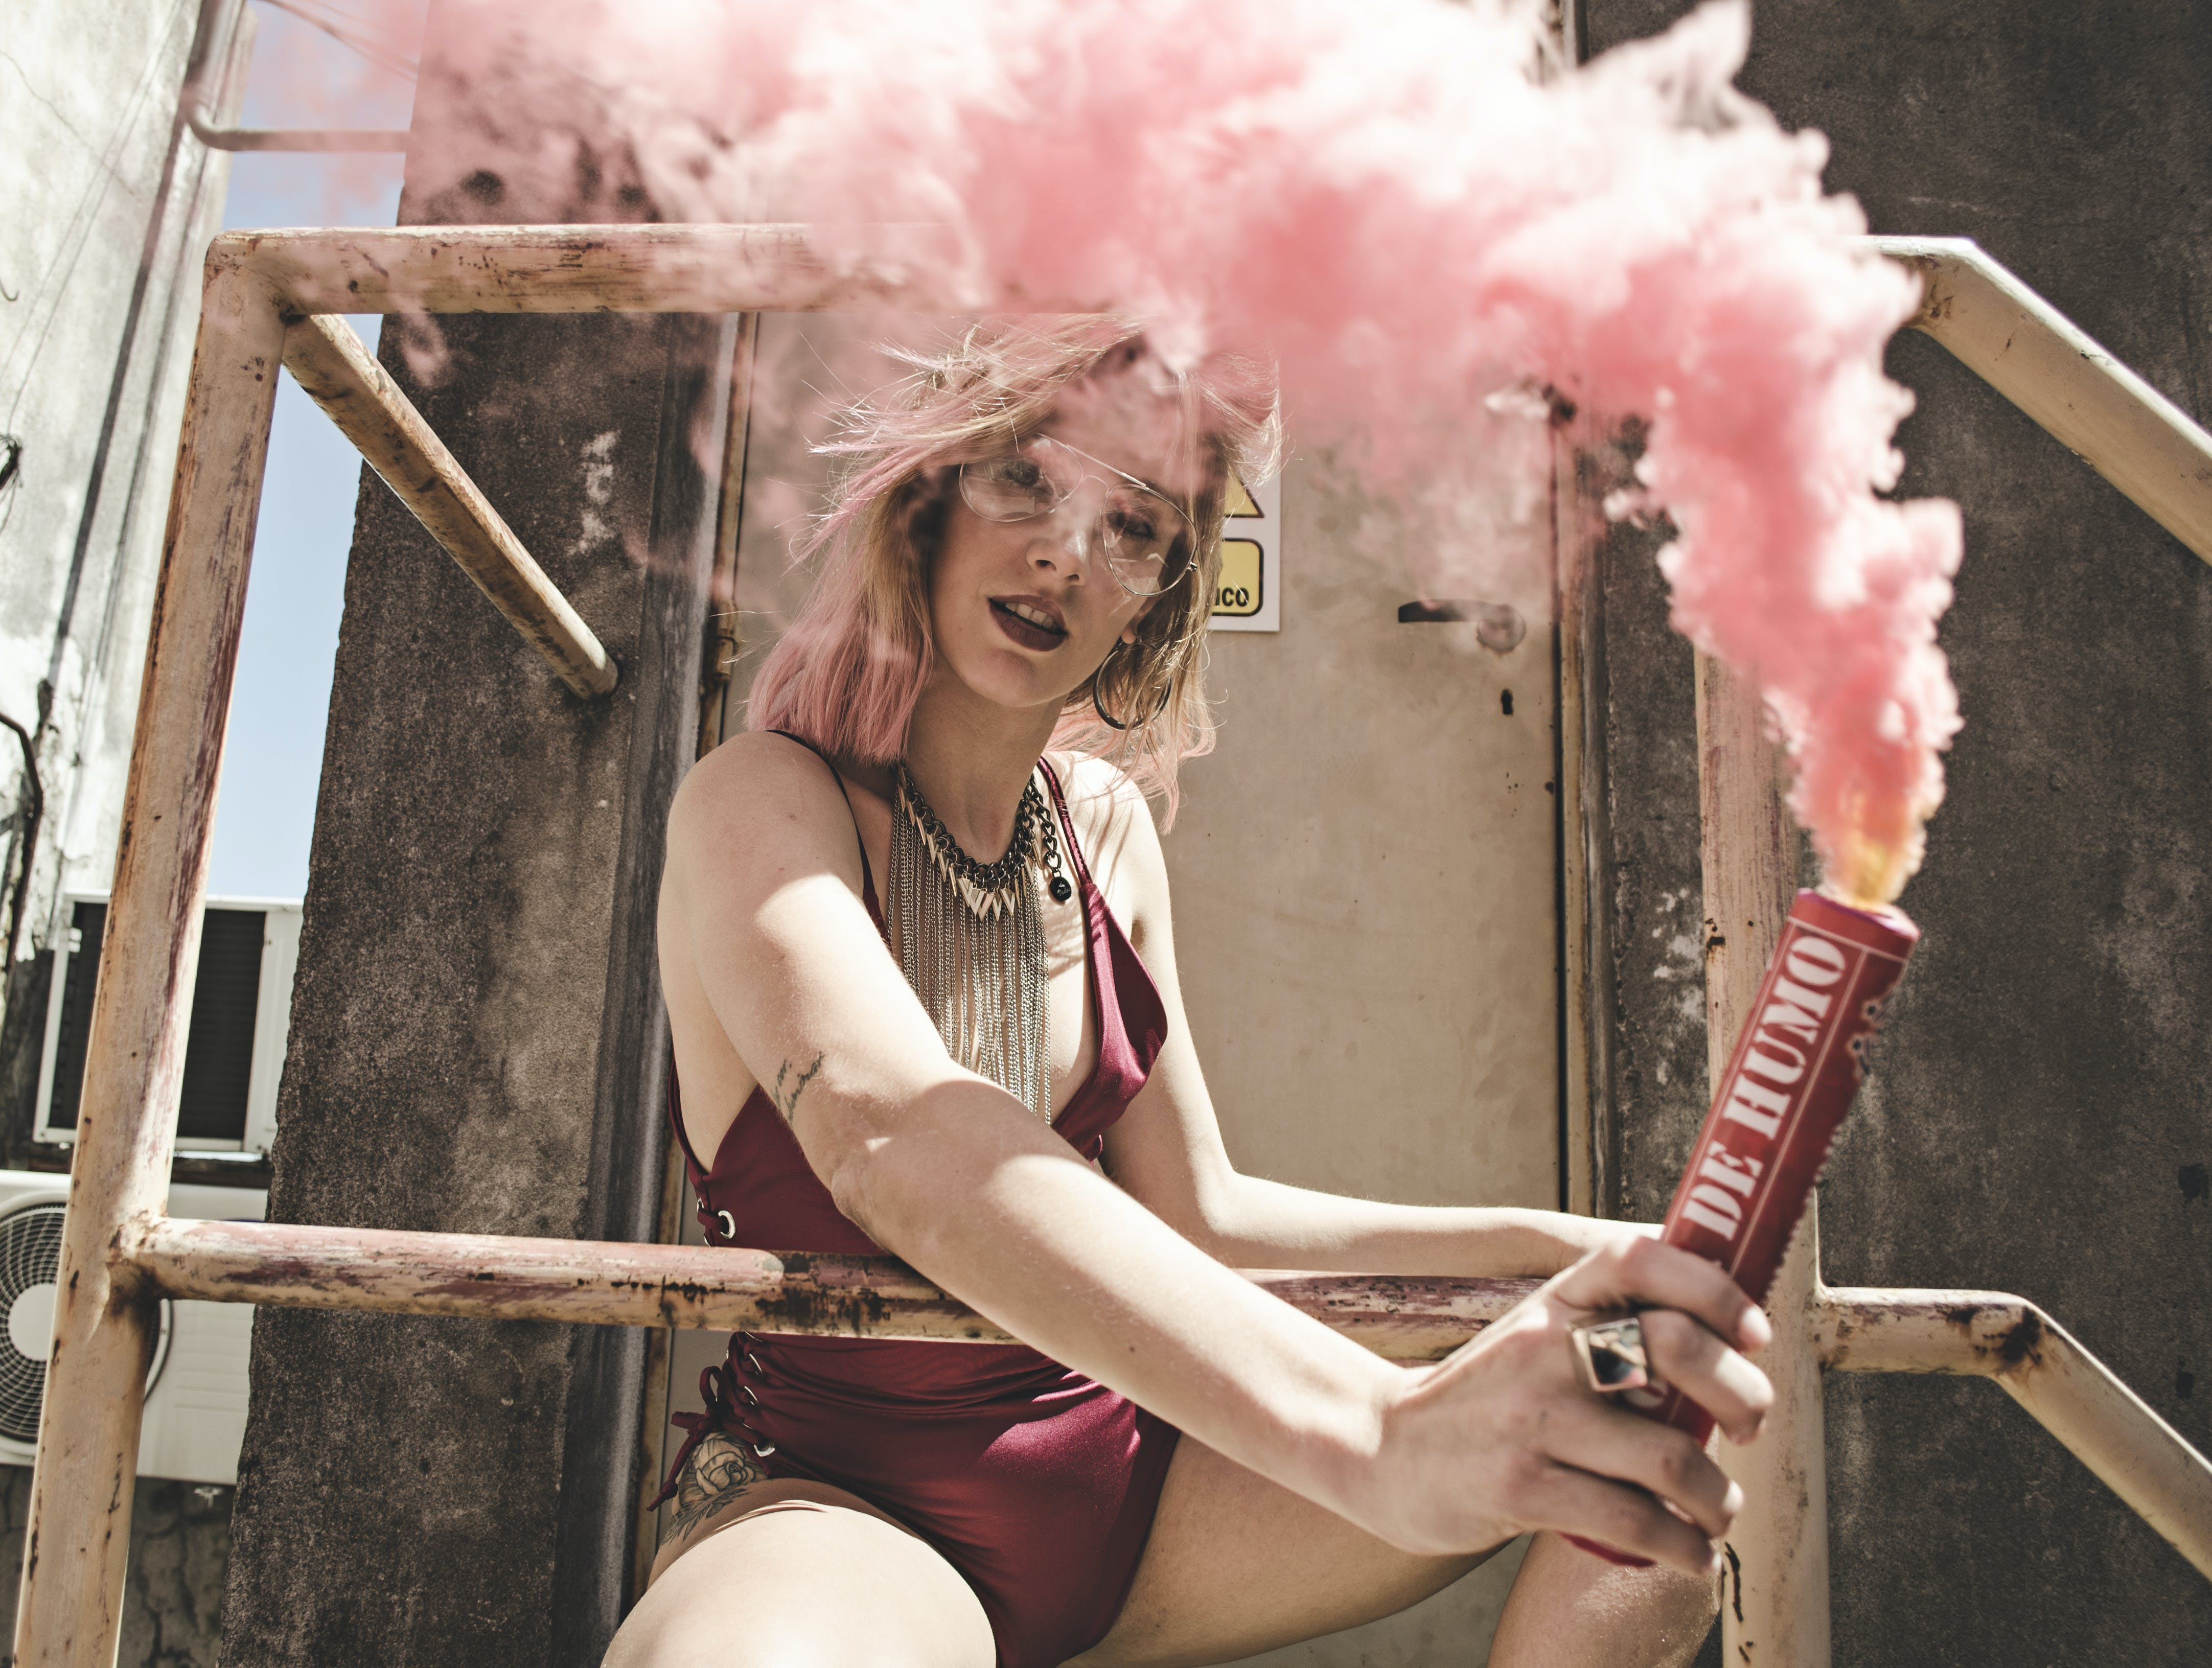 Woman in Maroon Monokini Holding Dynamite